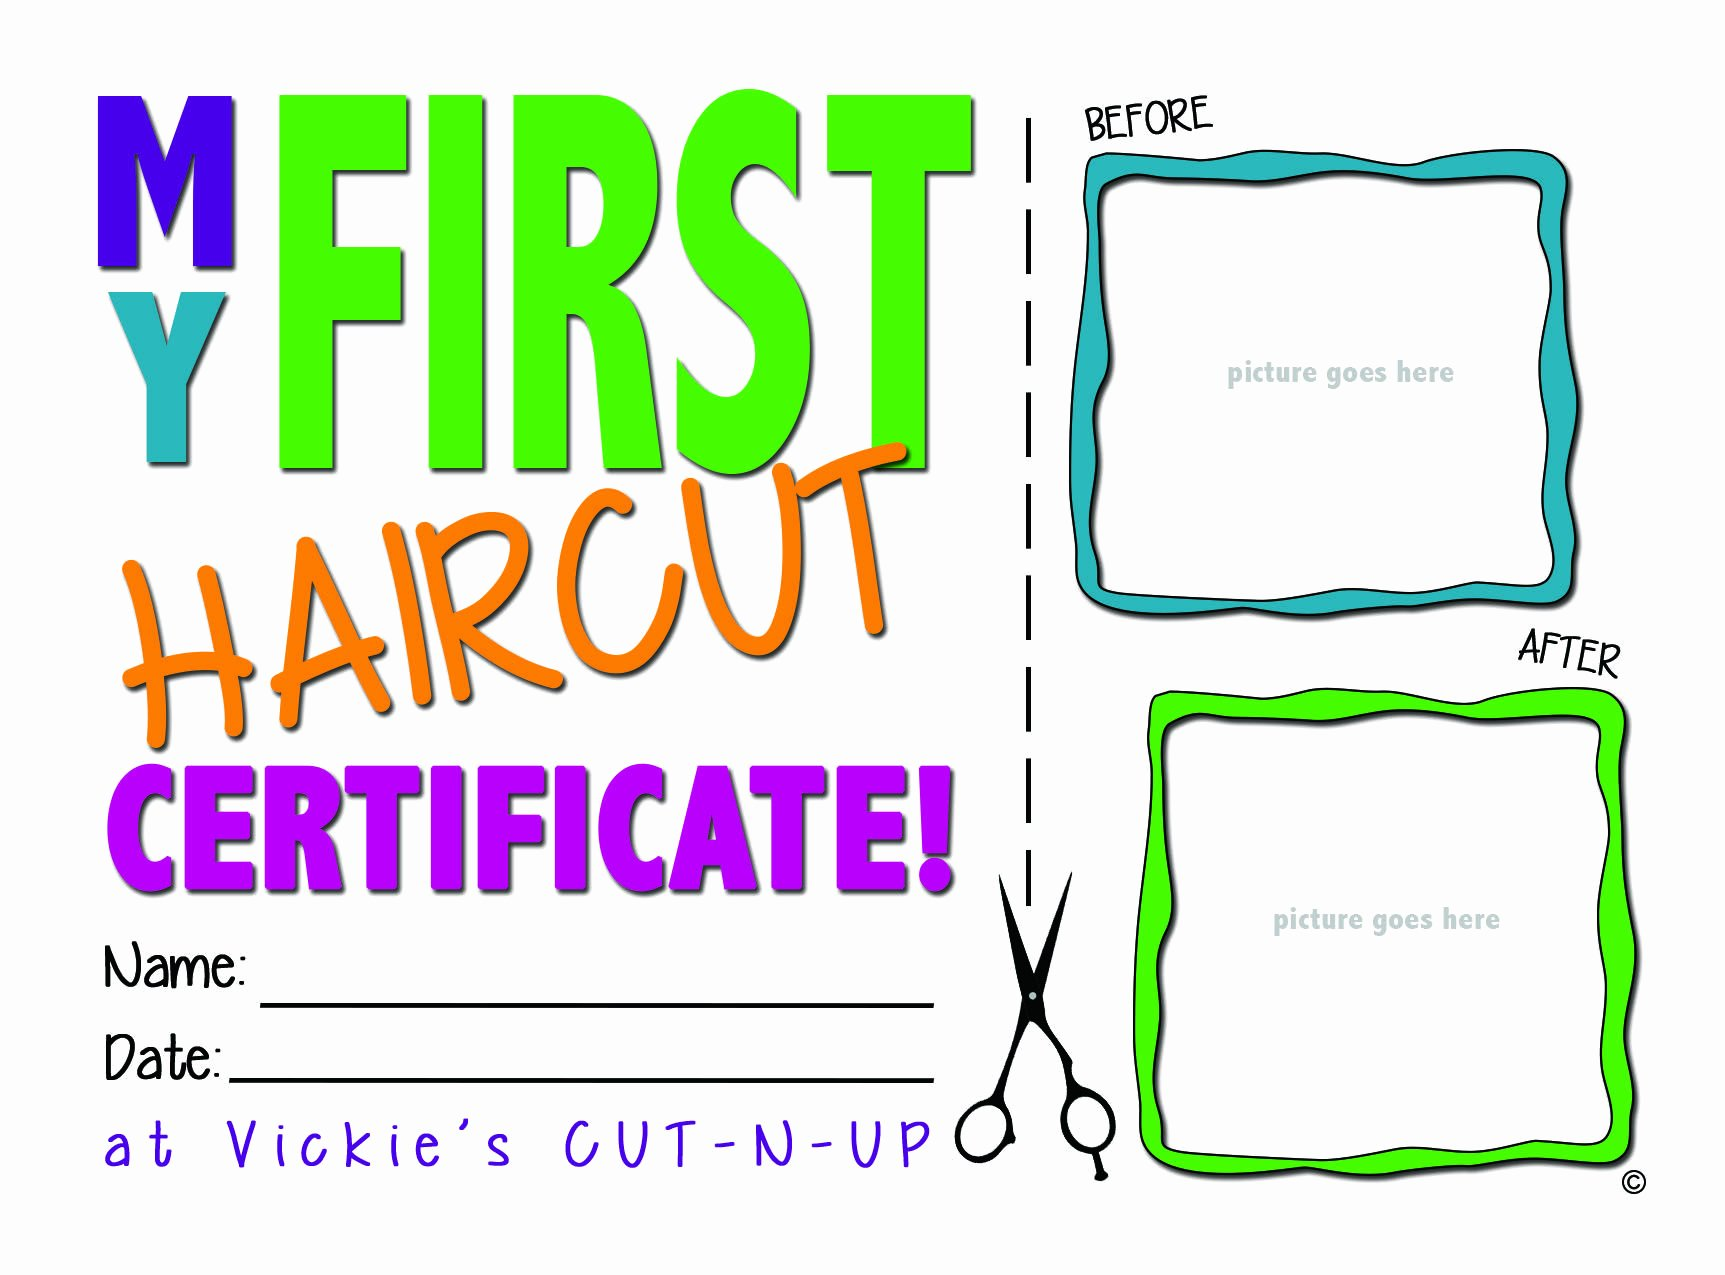 First Haircut Certificate Template Unique Printable Haircut Certificates Creativehobbyore